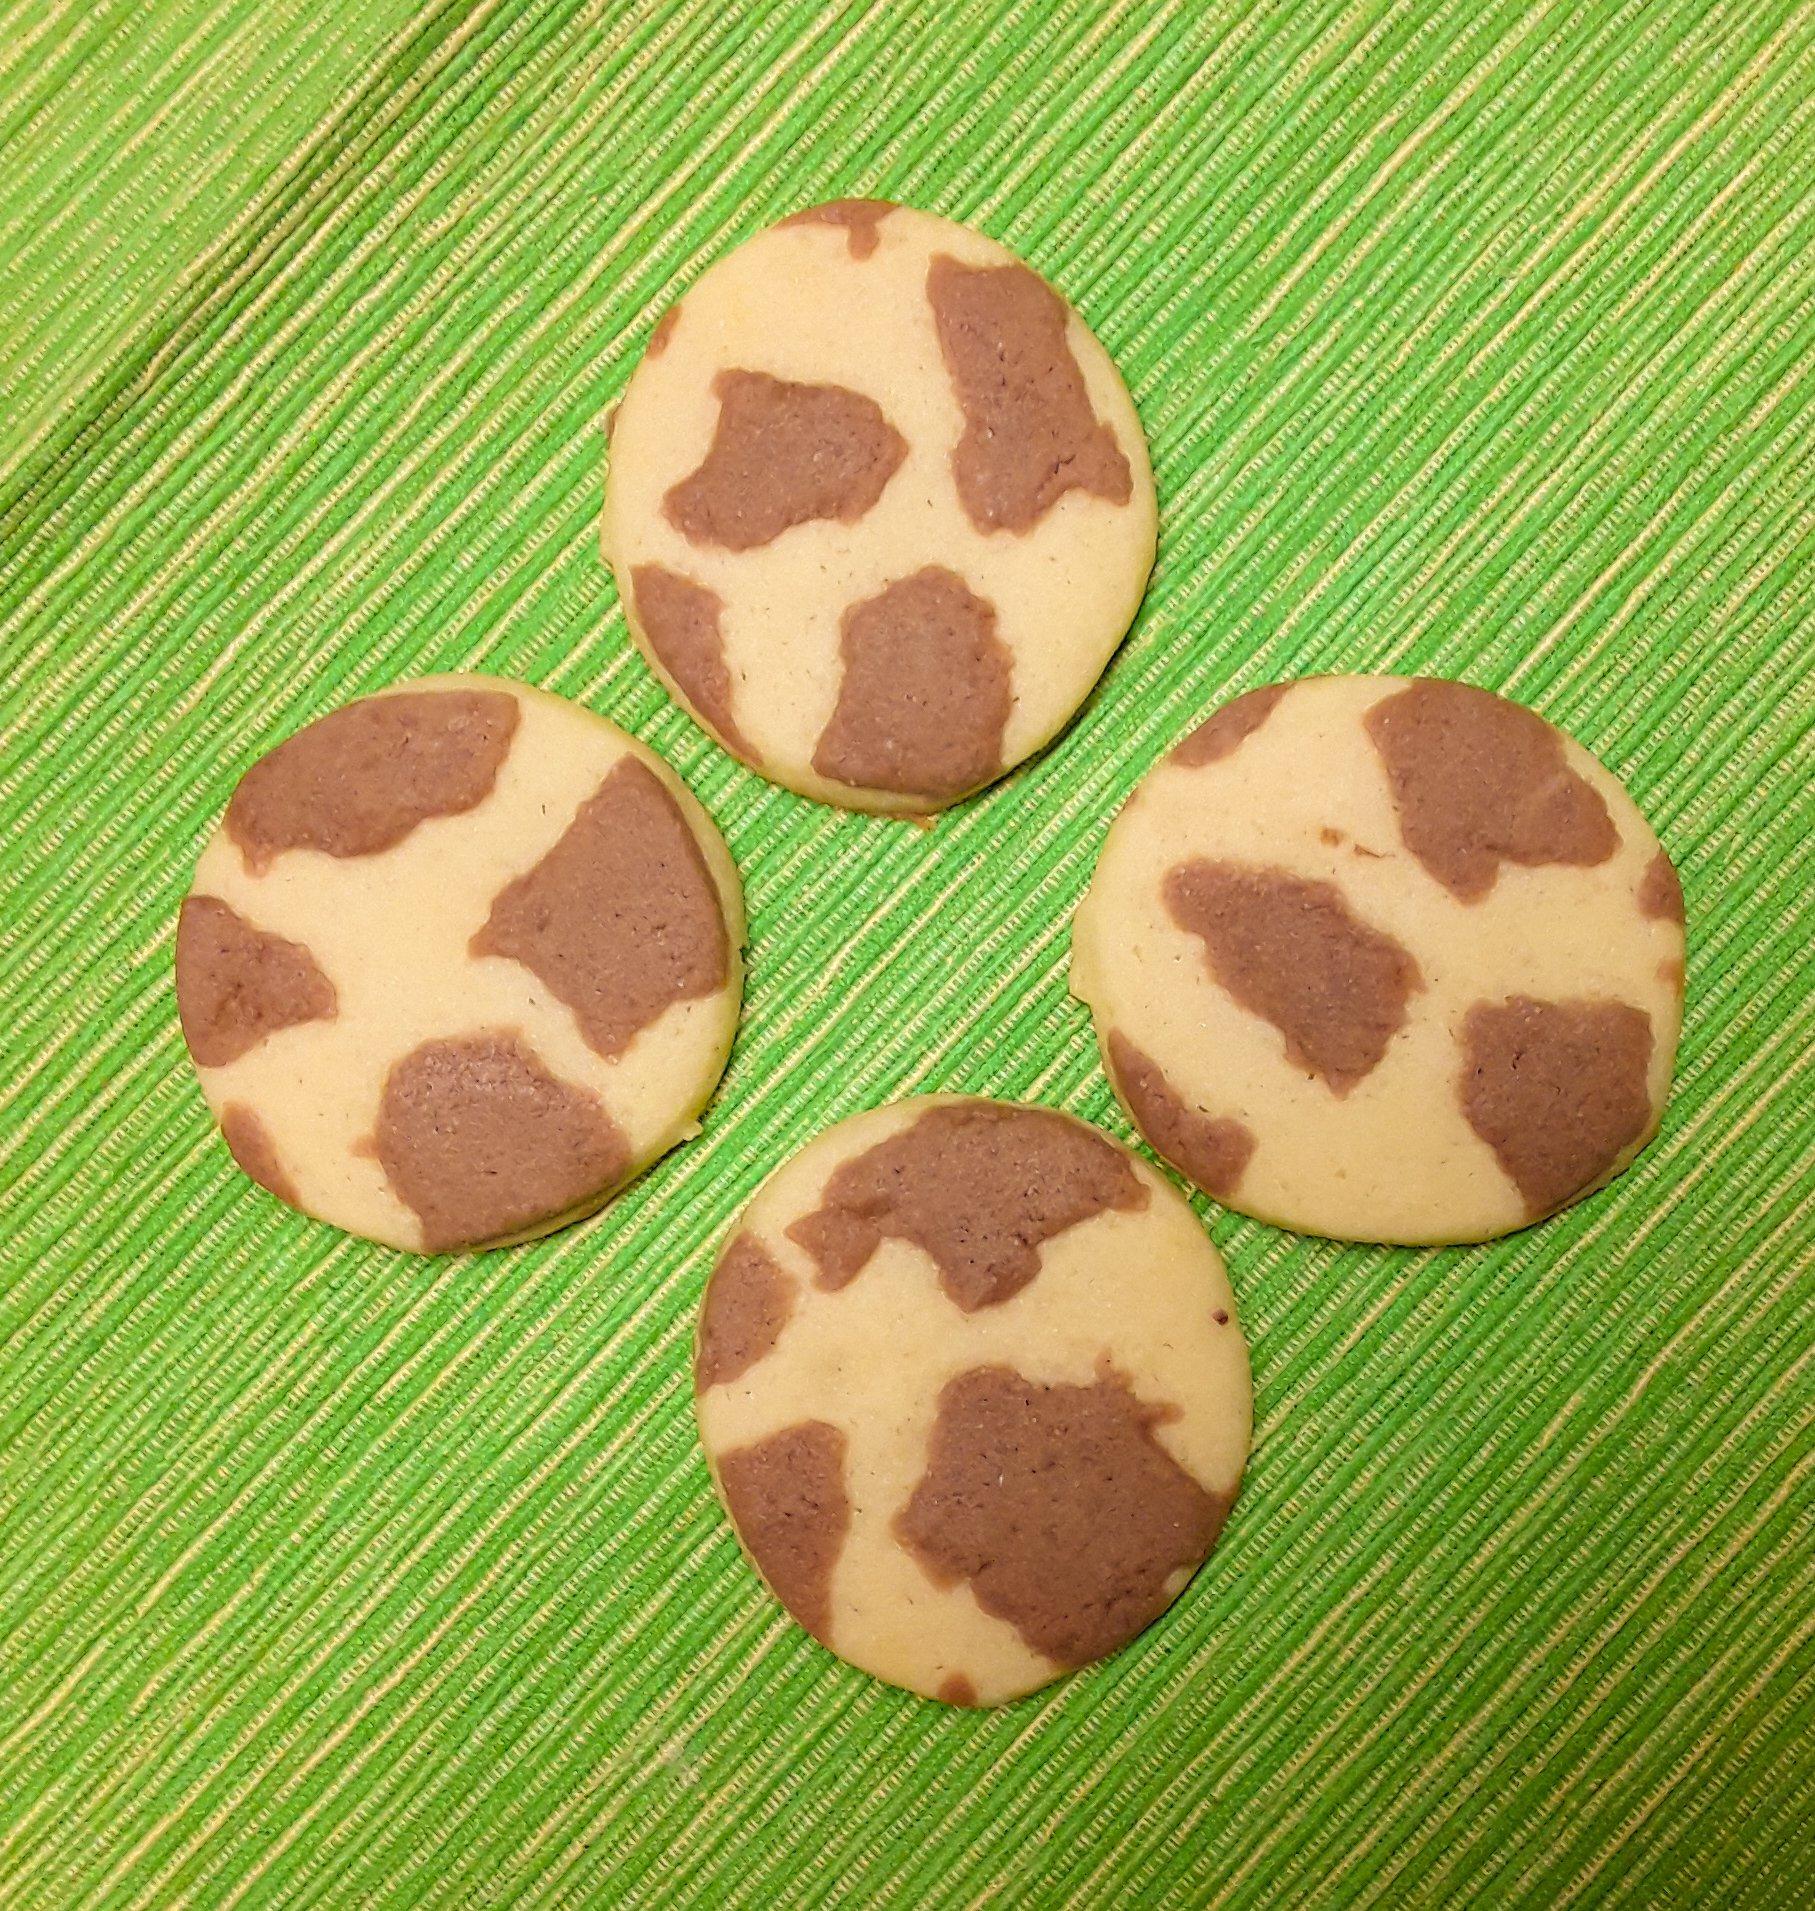 Giraffen-Kekse, neuer Versuch, Giraffenmuster